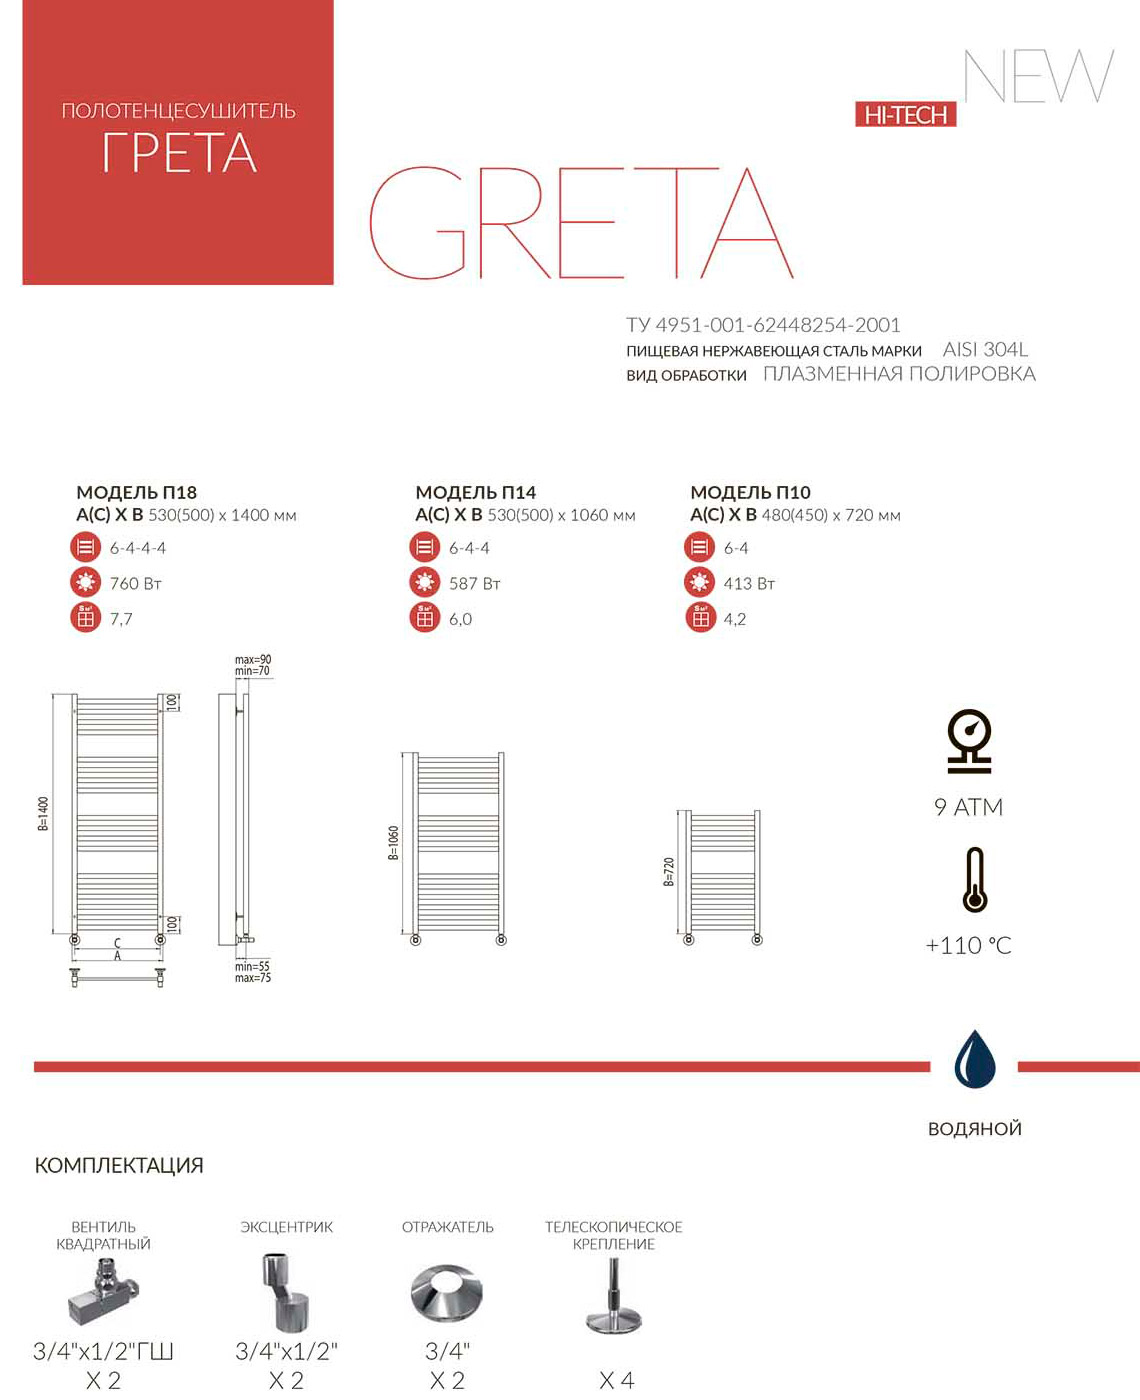 Схема полотенцесушителя Terminus Грета